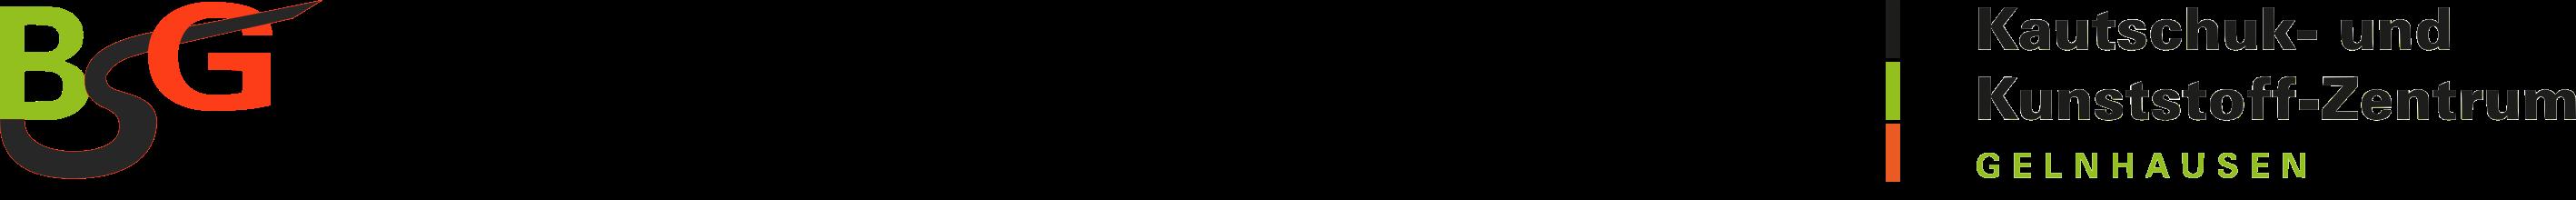 Kunststofftechniker Gelnhausen